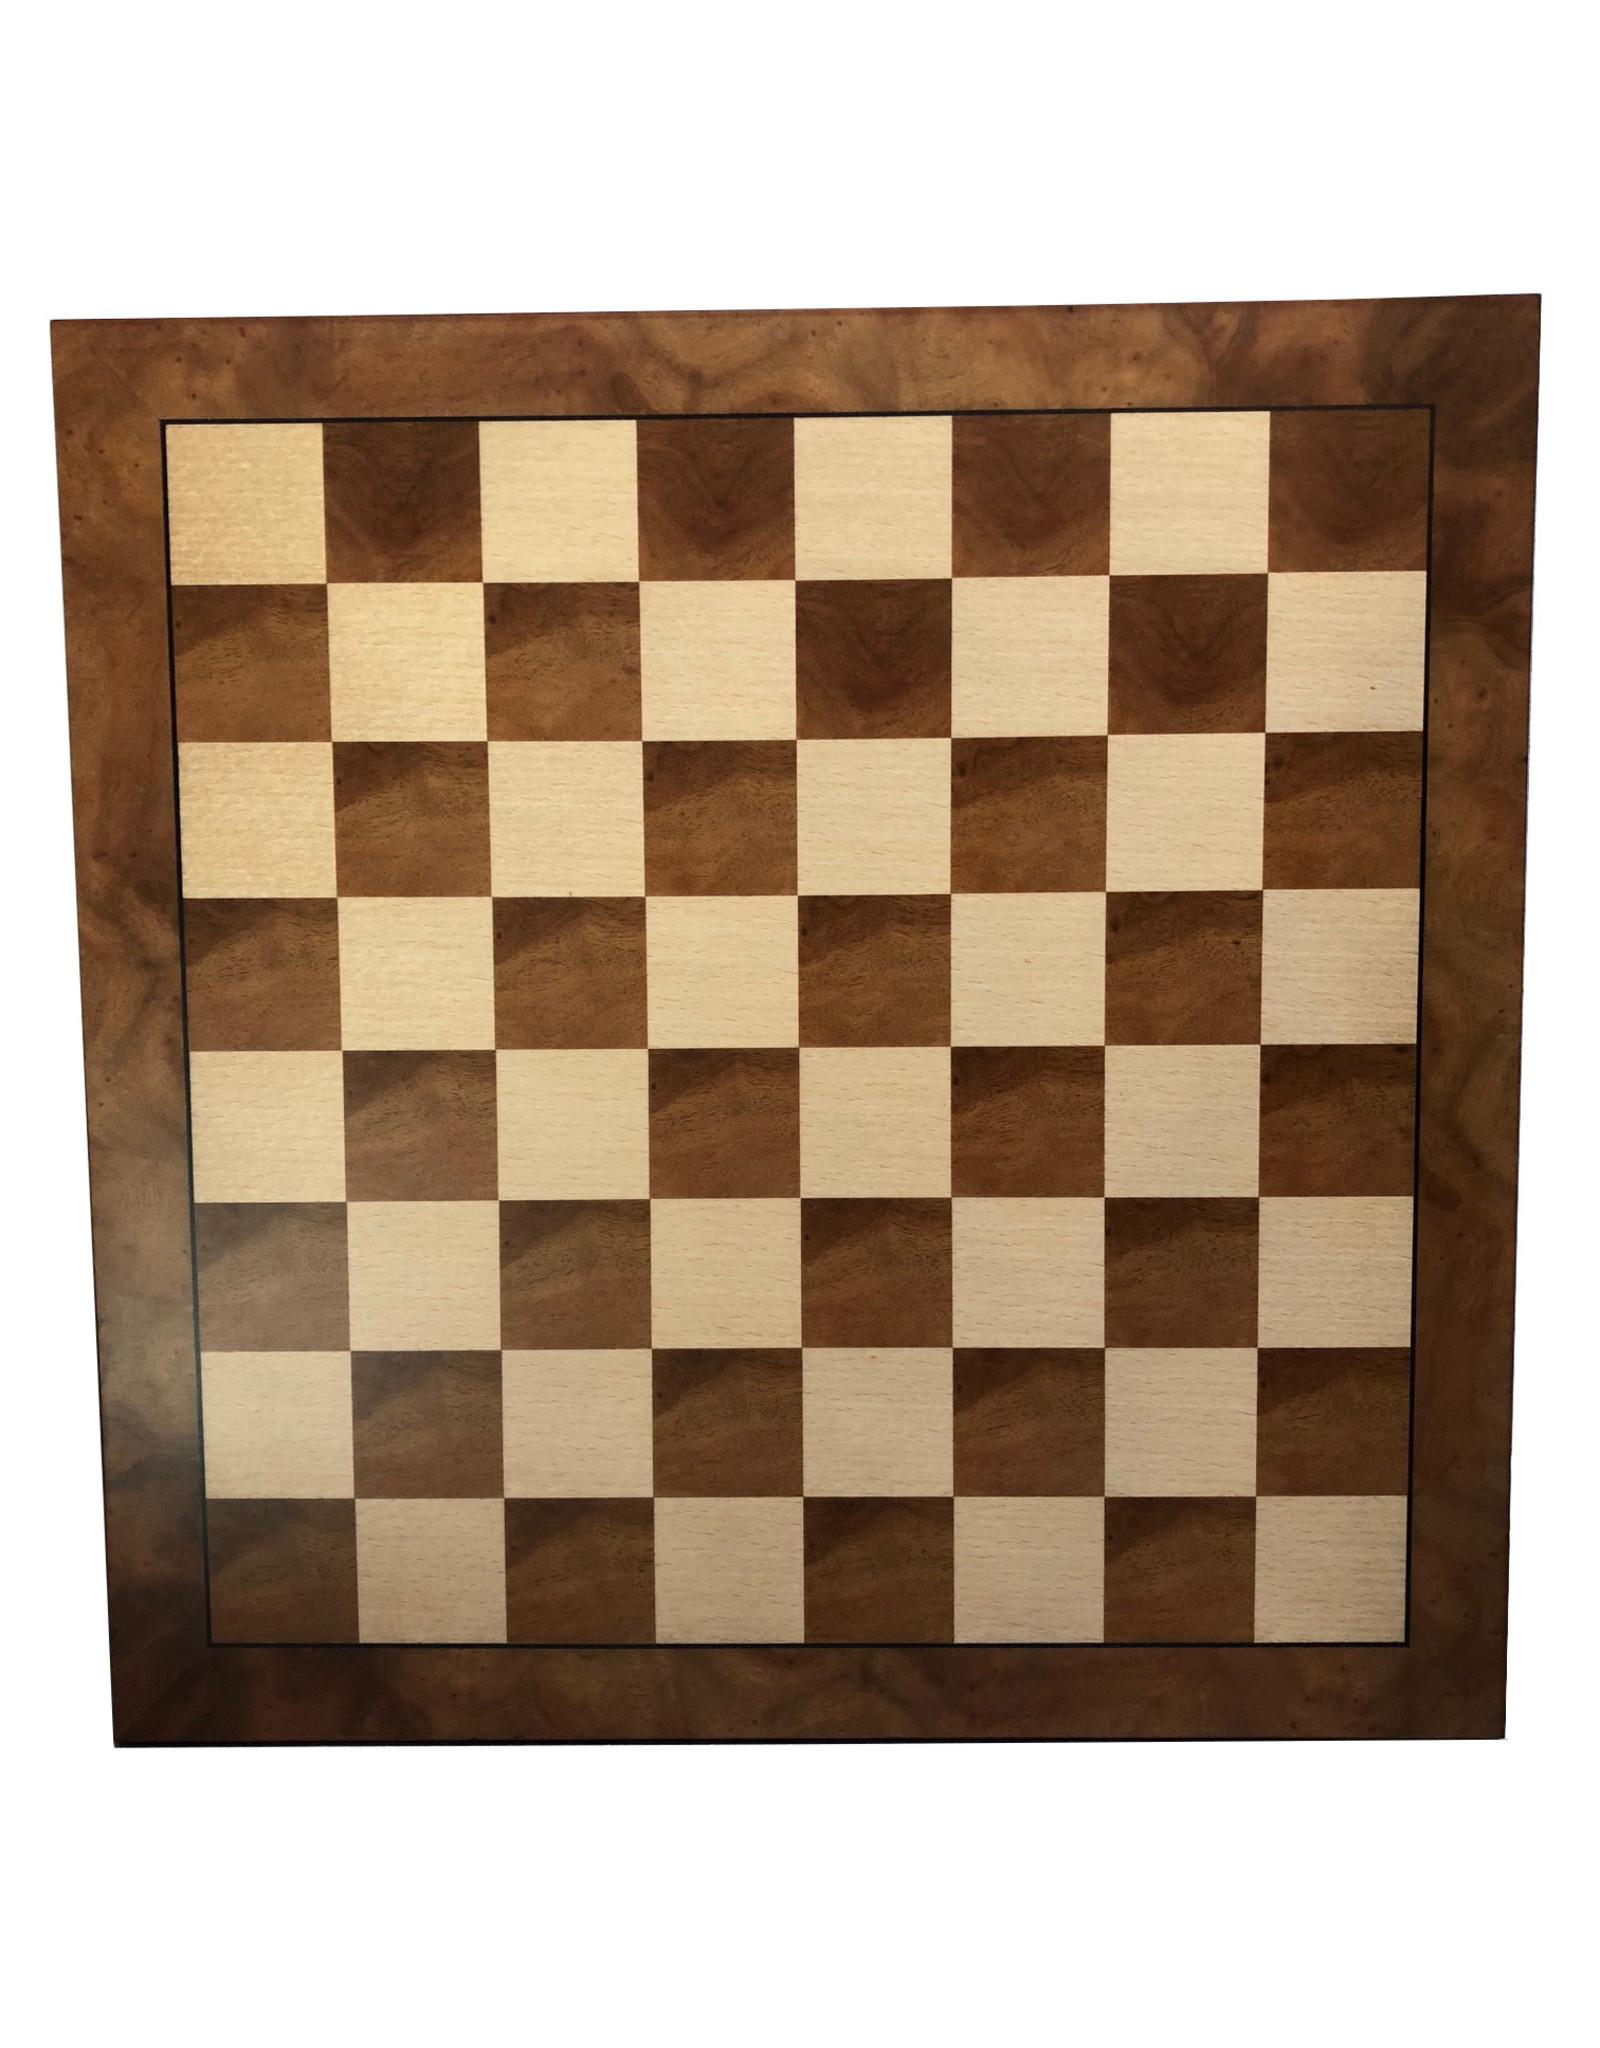 "Wood Expressions CHESSBOARD, 18'' CAMPHOR BURL 2"" SQUARES"